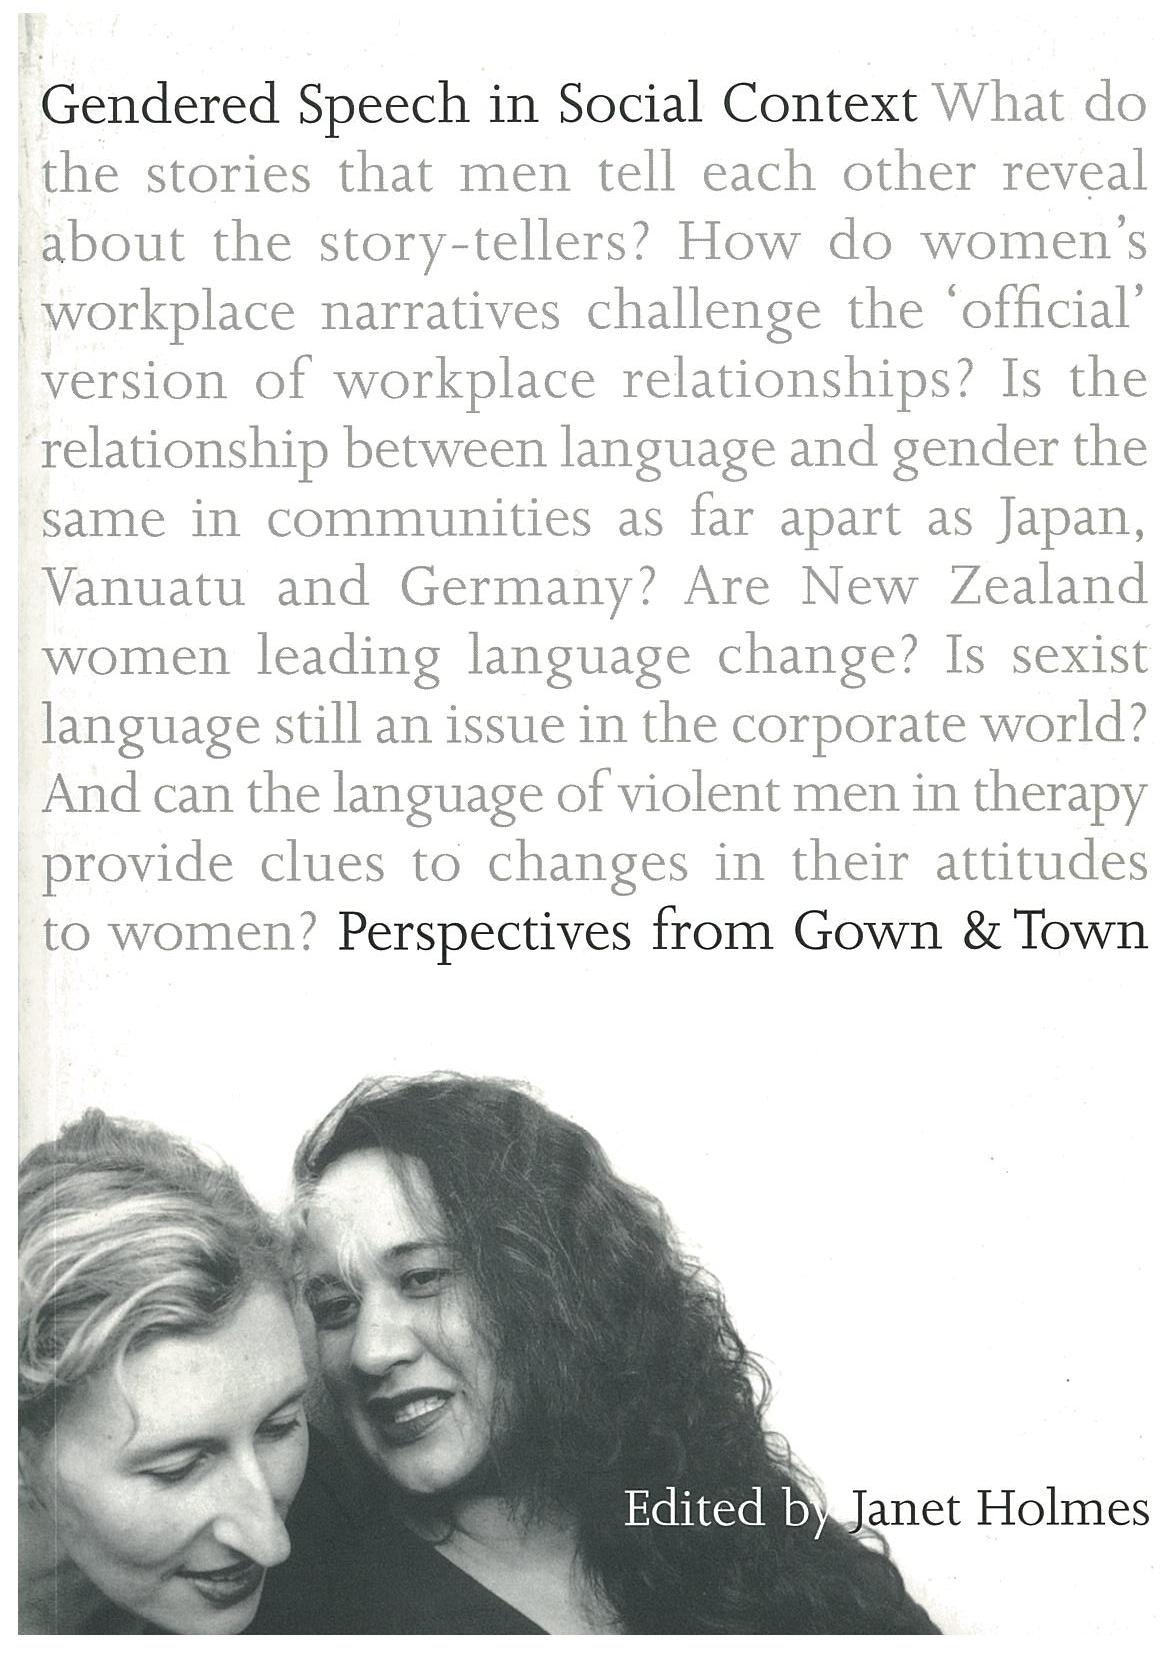 Gendered Speech in Social Context